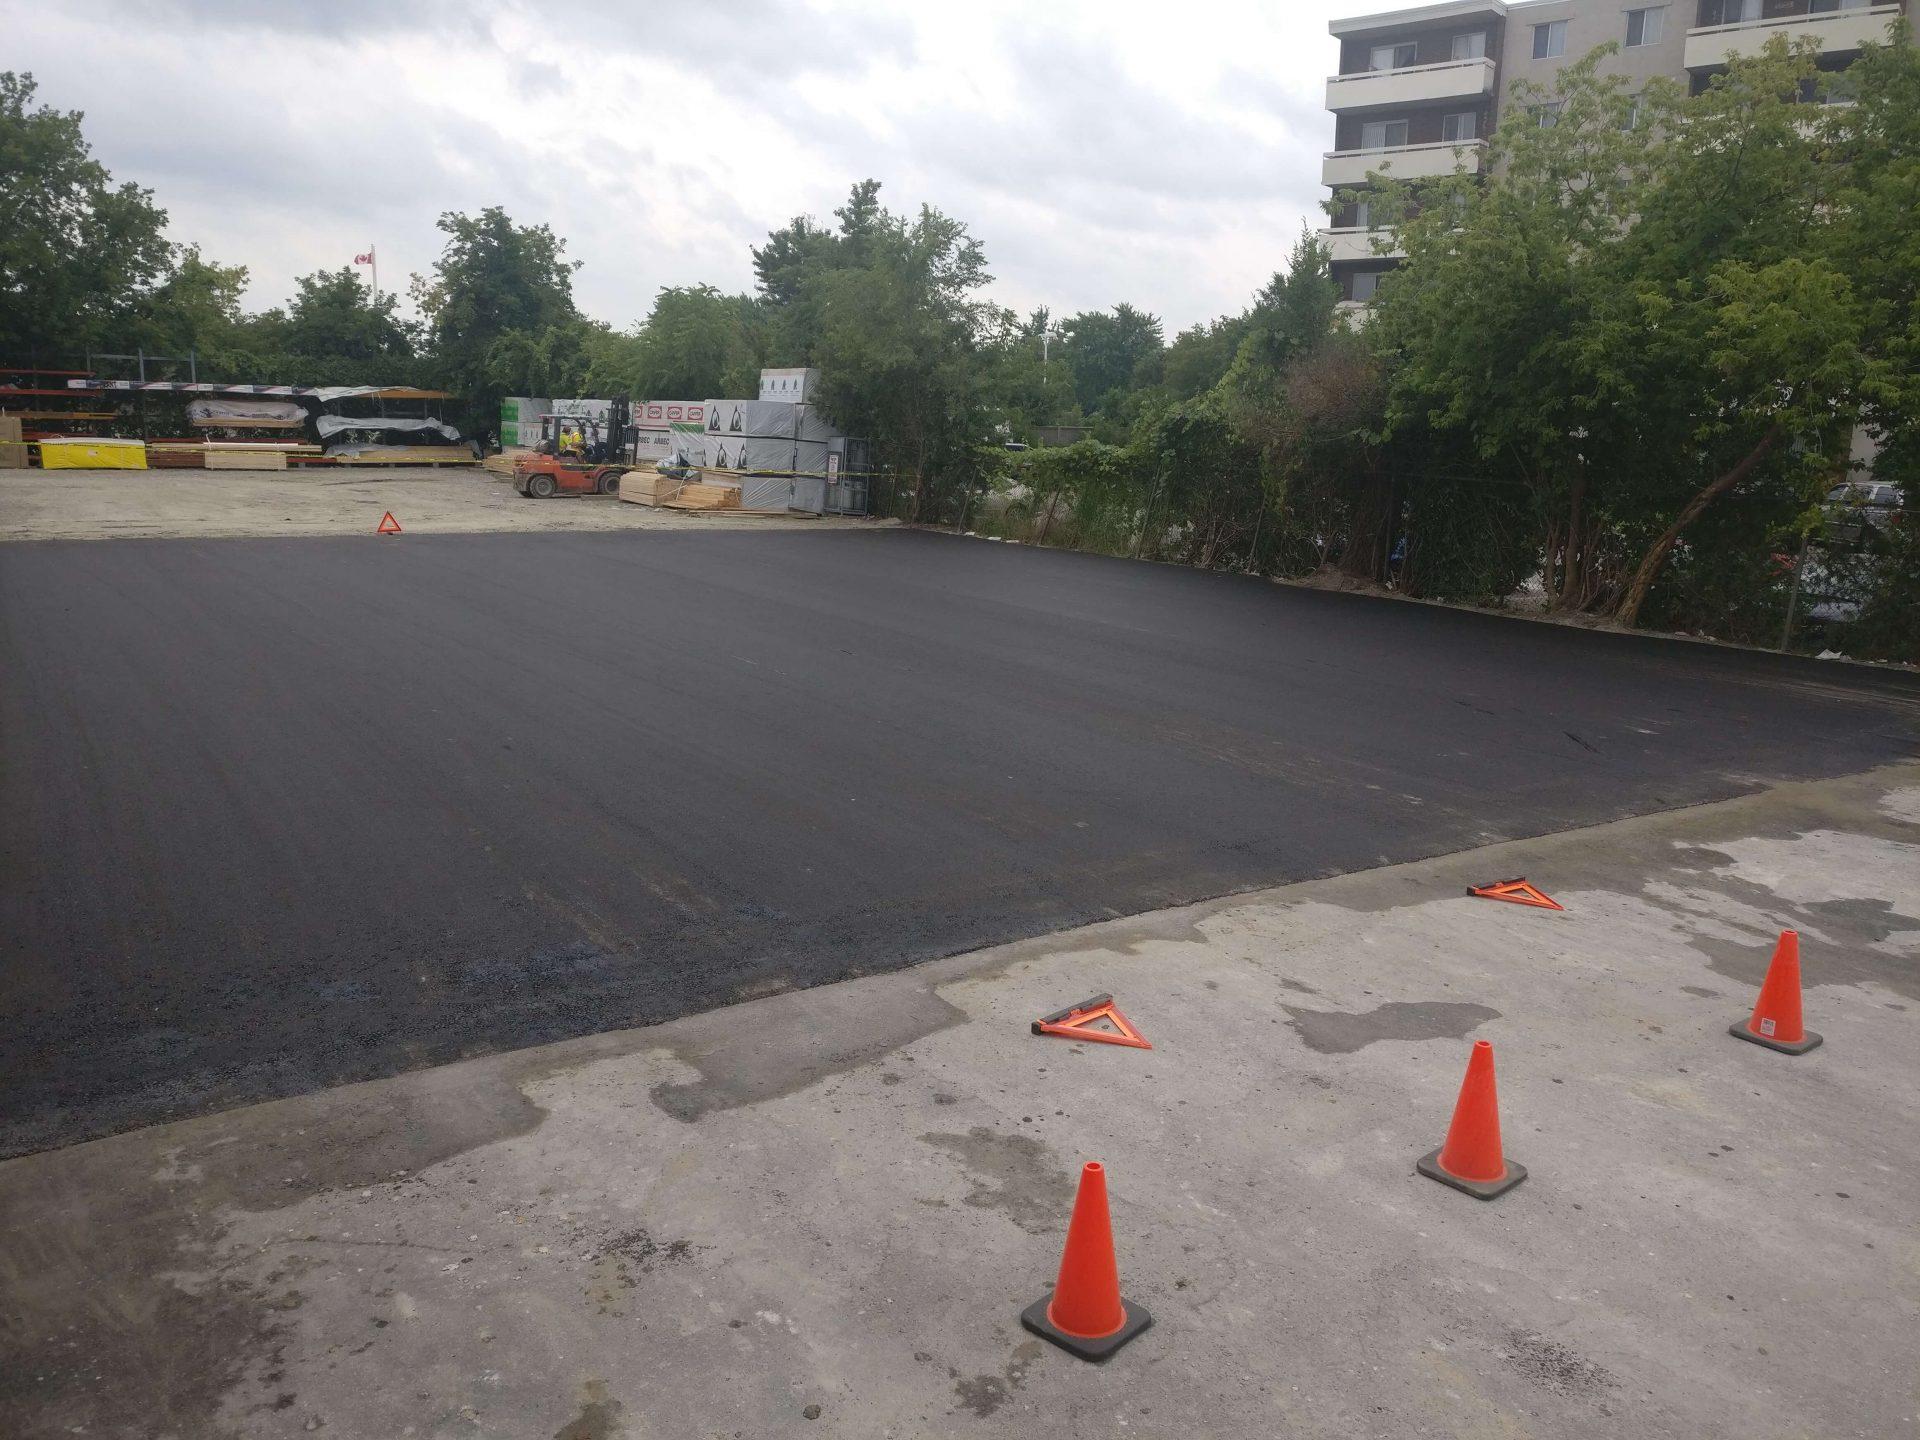 paved asphalt with pylons